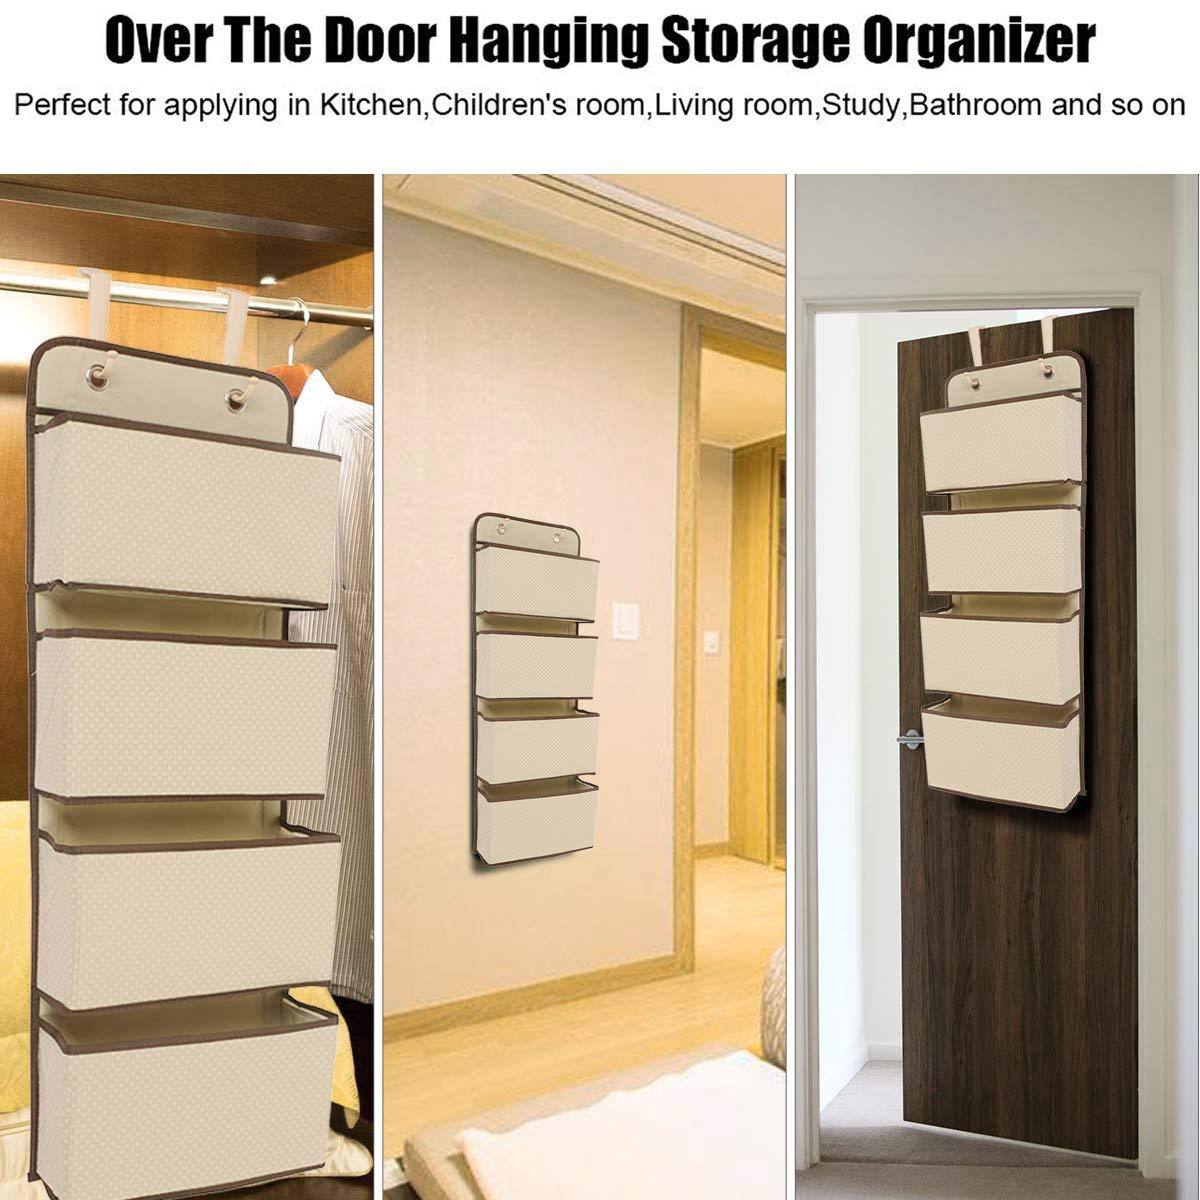 4-Pocket Hanging Wall Organizer in Grey Color Mangotree Hanging Shelves